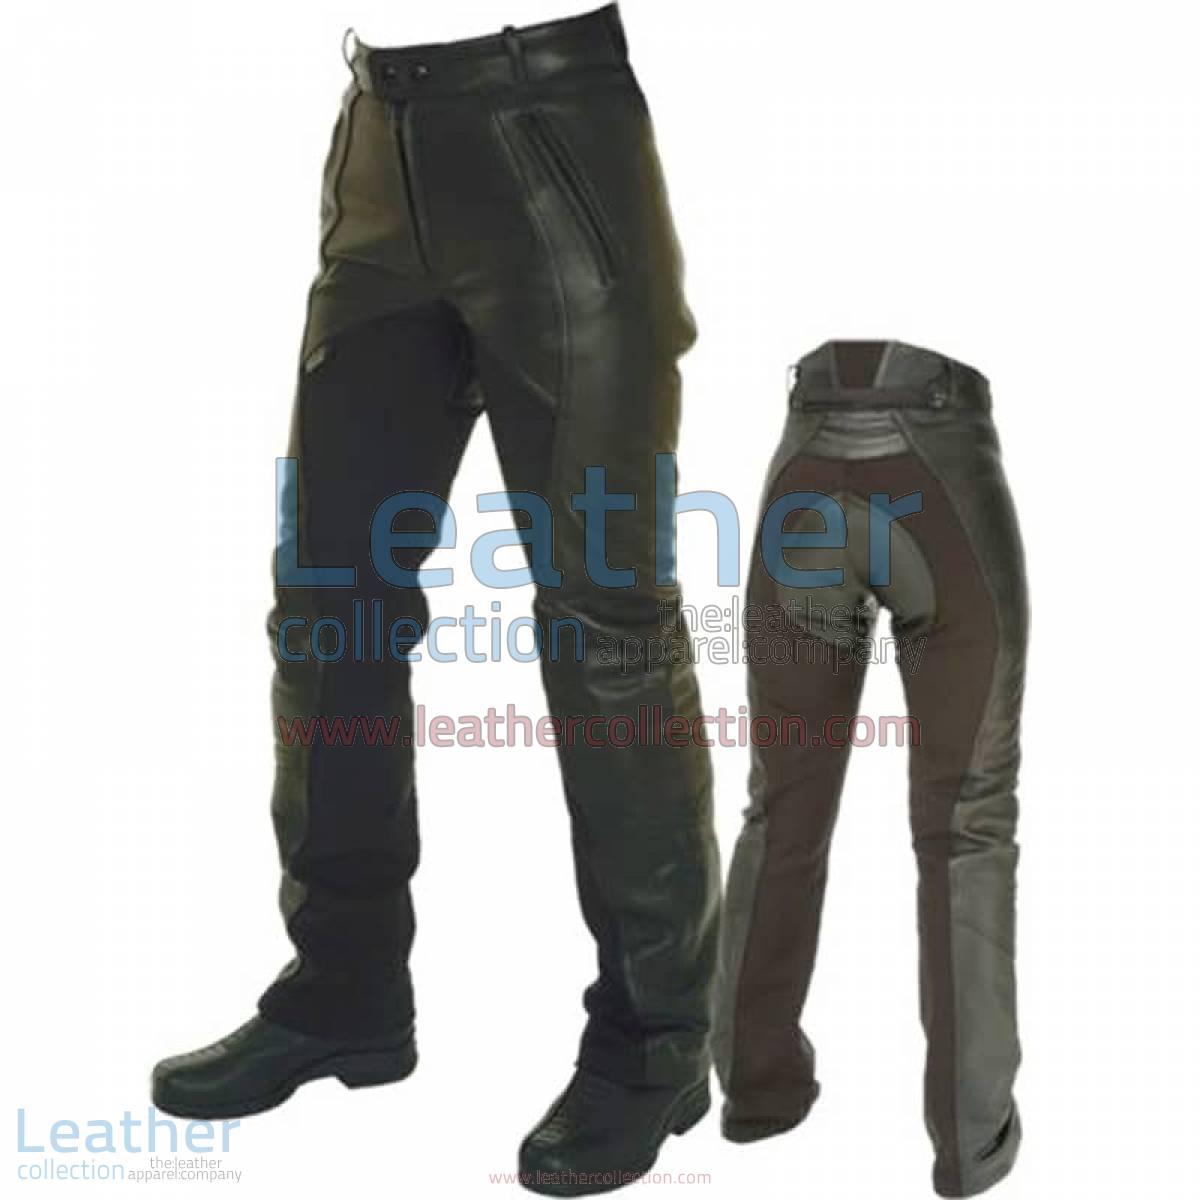 Comfort Motorcycle Pants | comfort pants